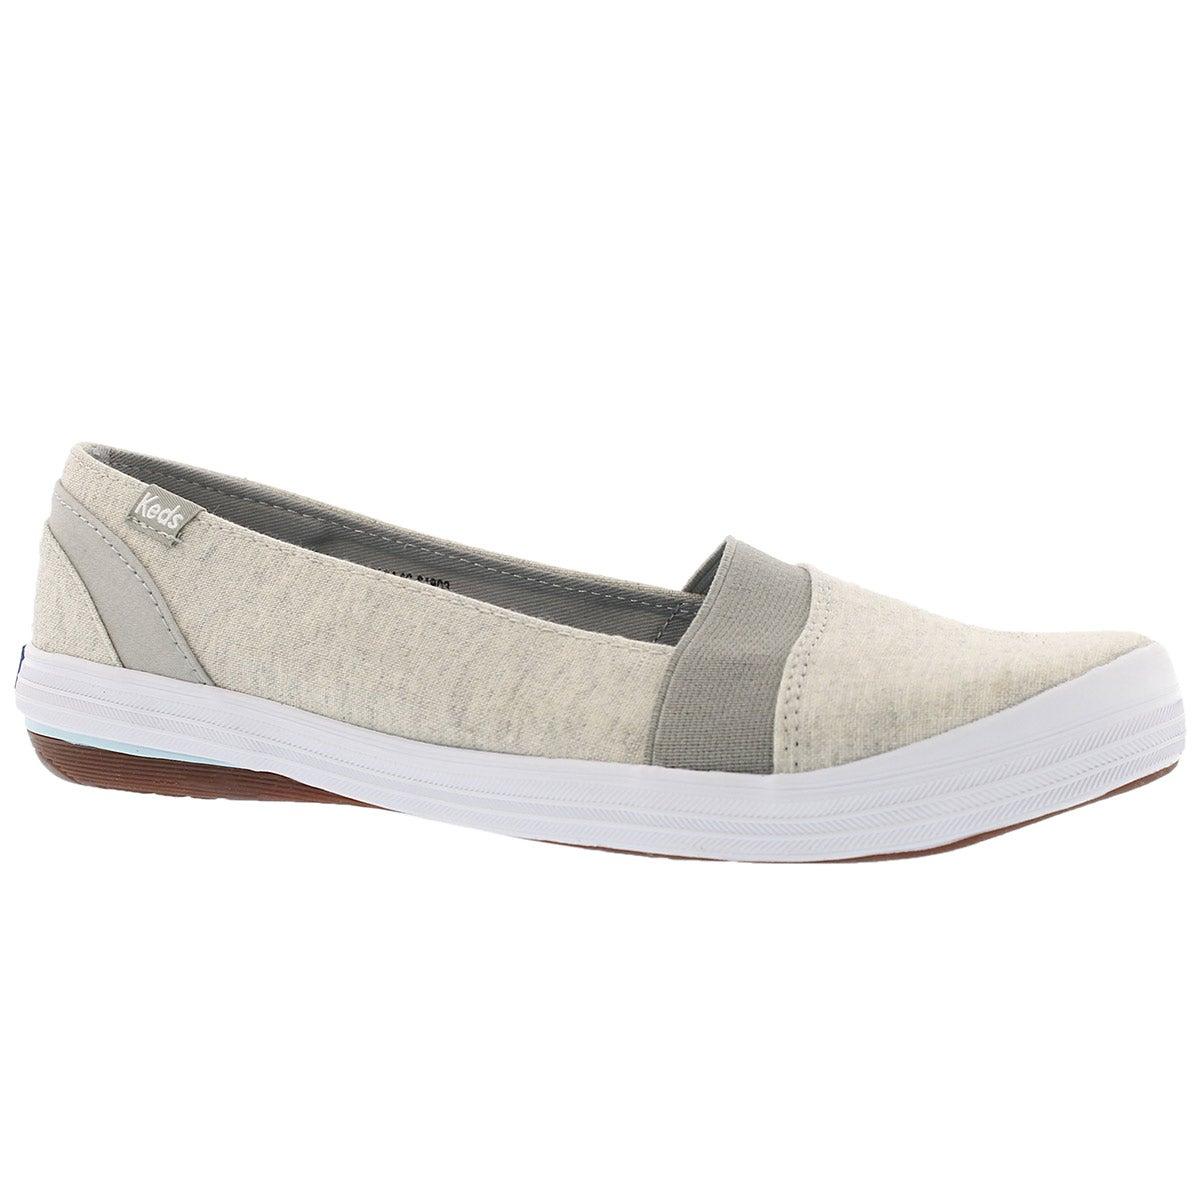 Women's CALI light grey casual slip ons